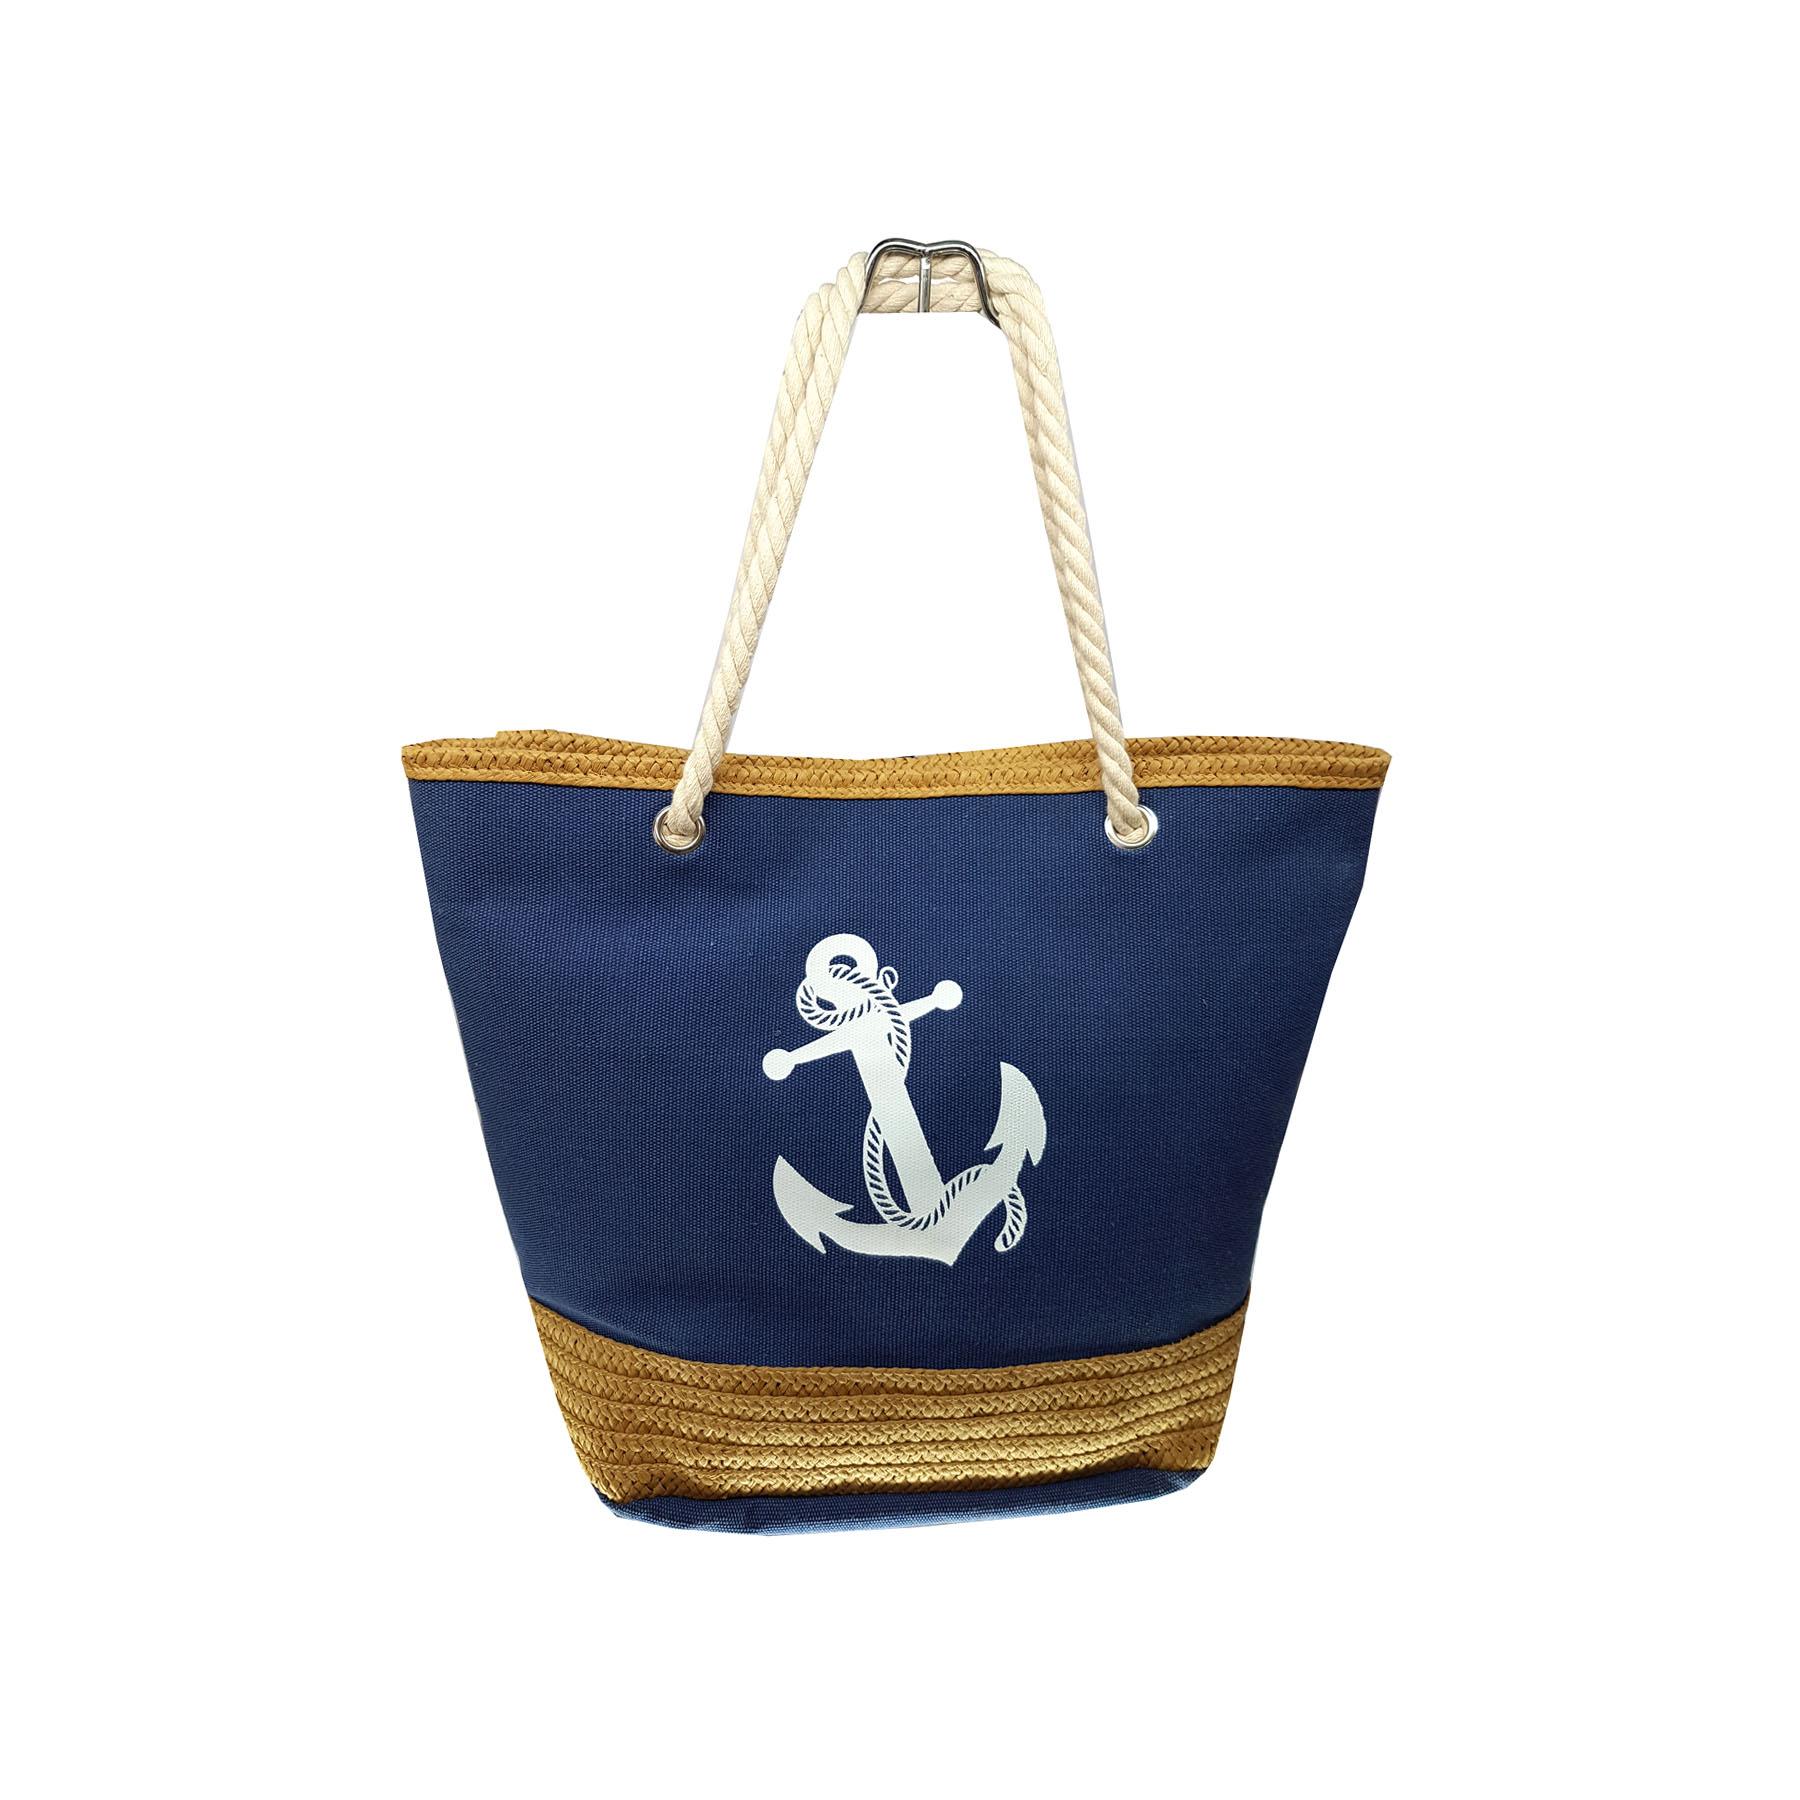 3b41cca59d Beach Brand Bags